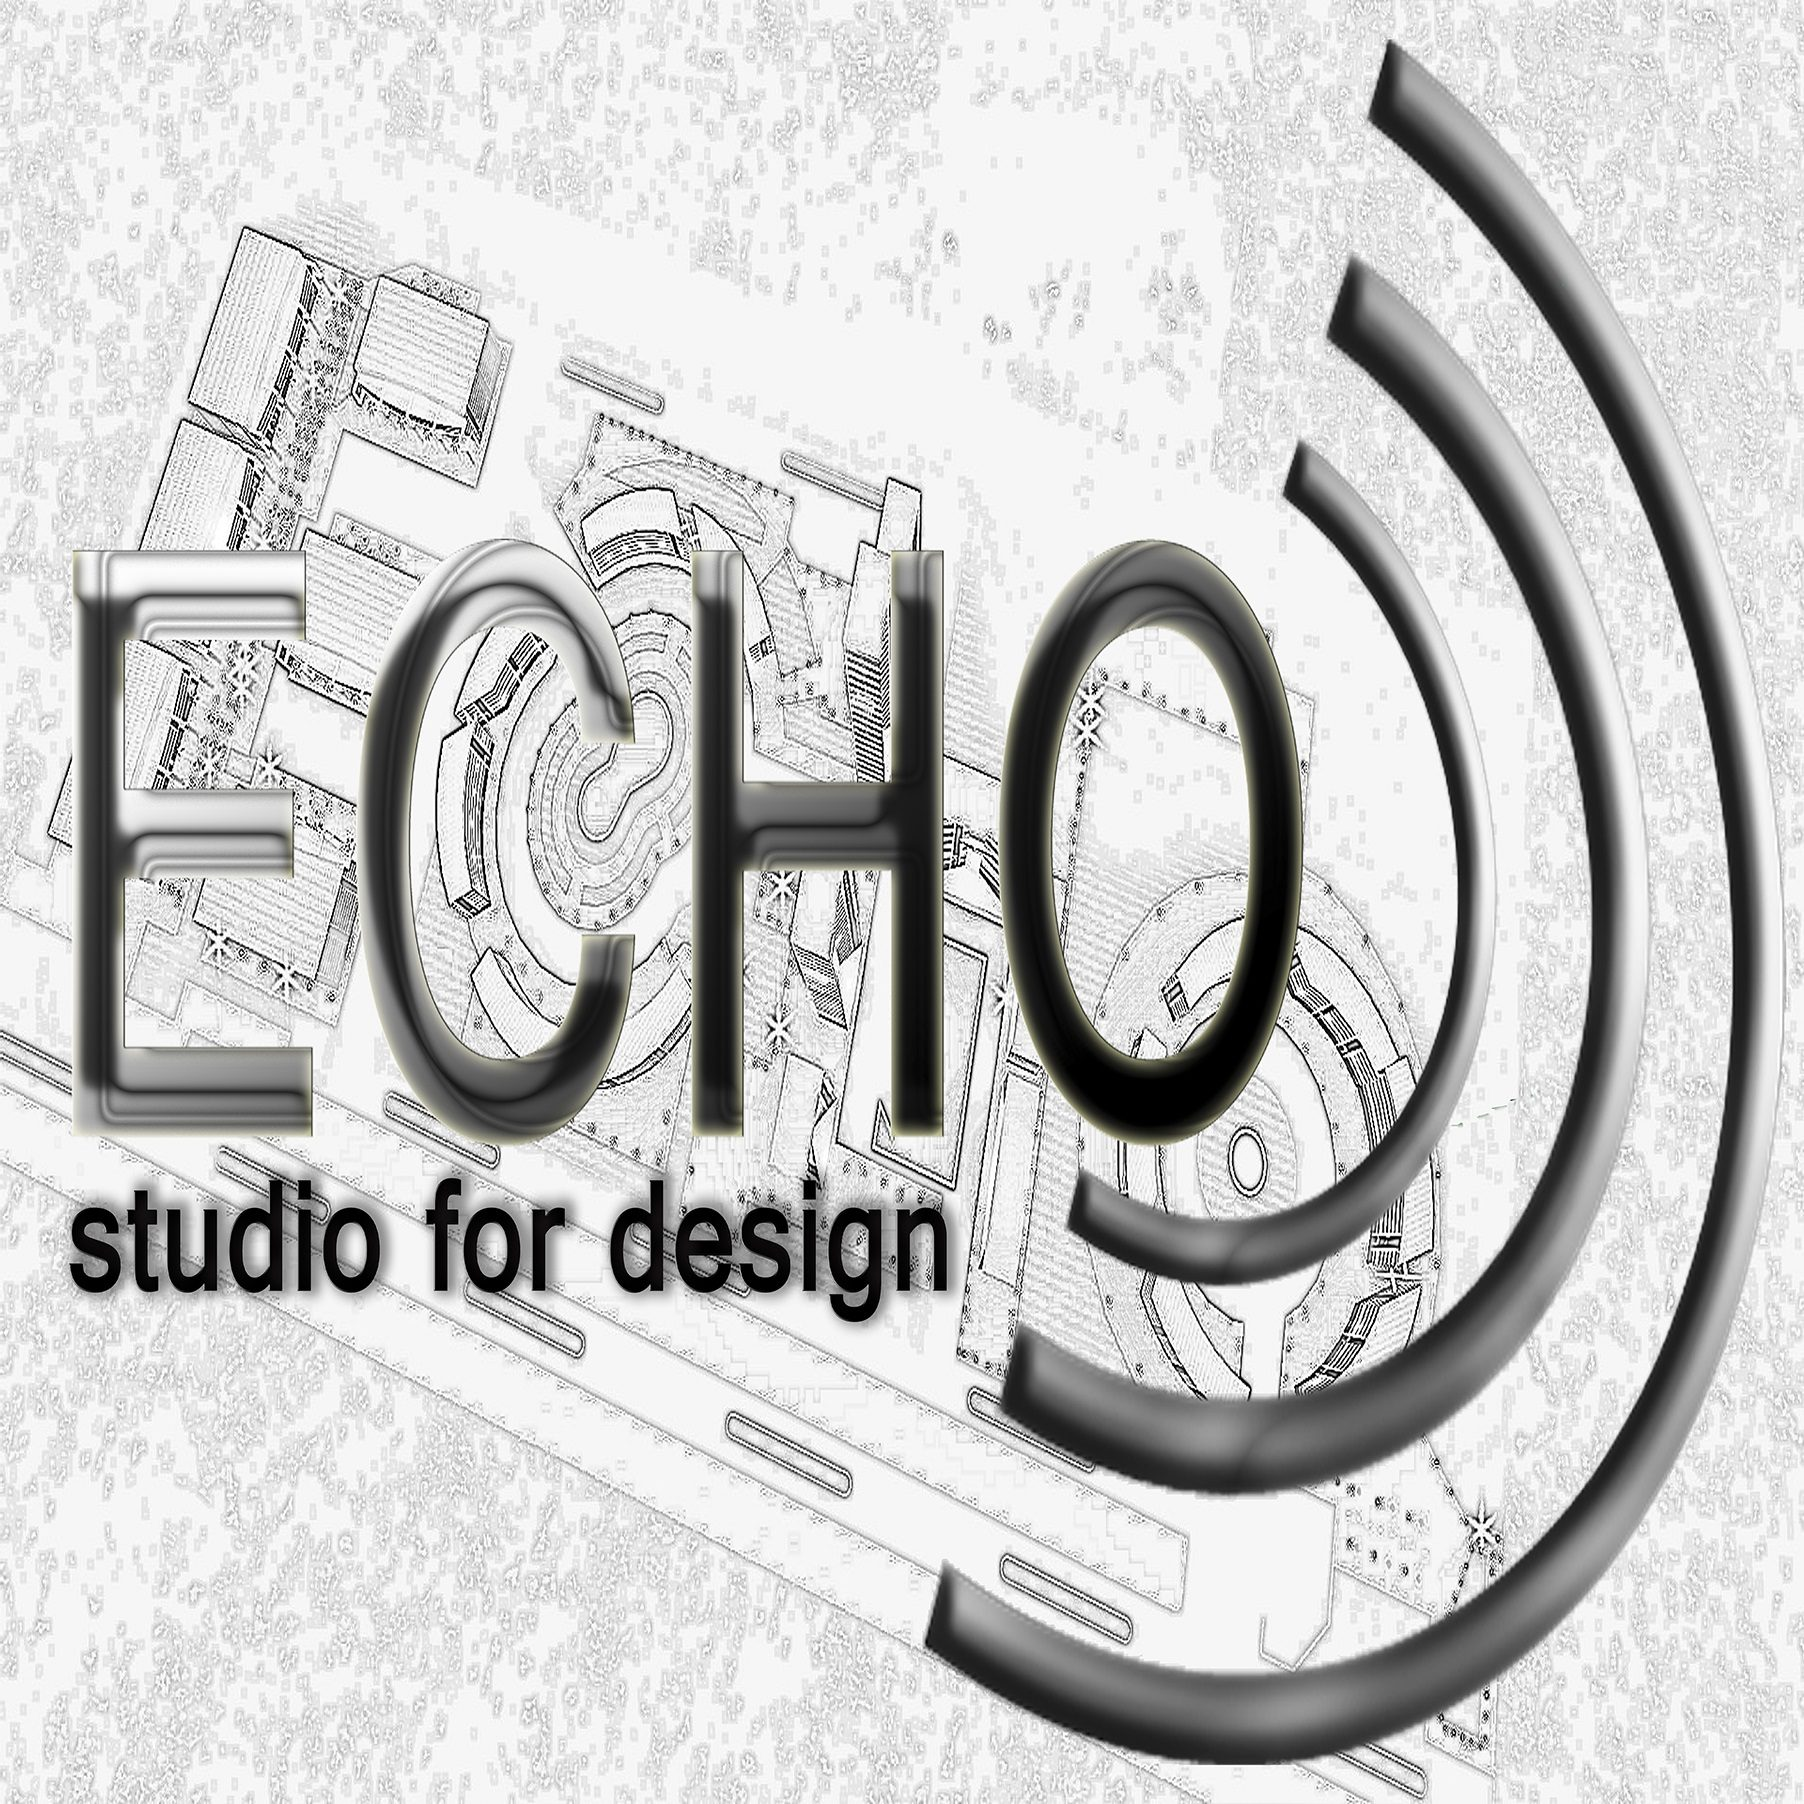 ECHO STUDIO FOR DESIGN